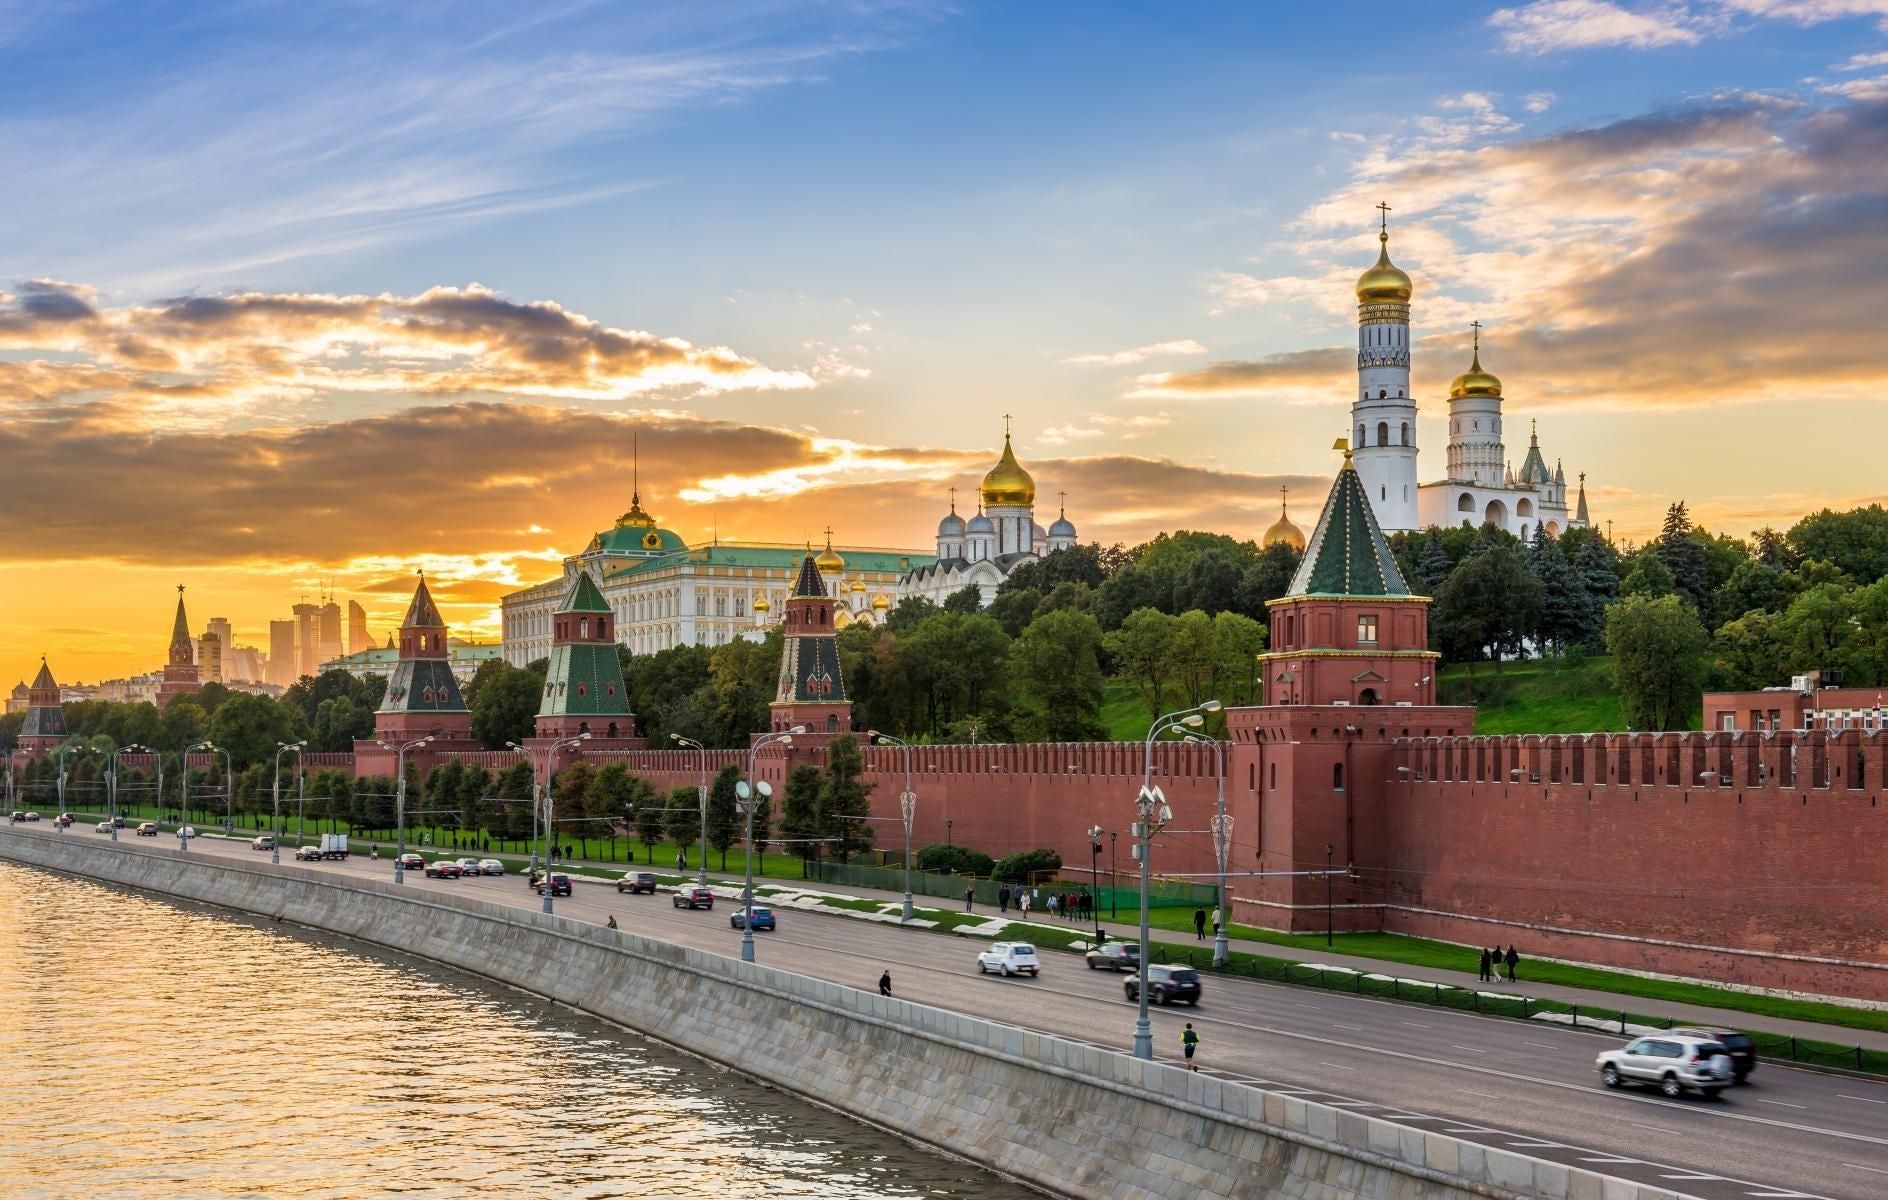 Картинки виды москвы, открытки